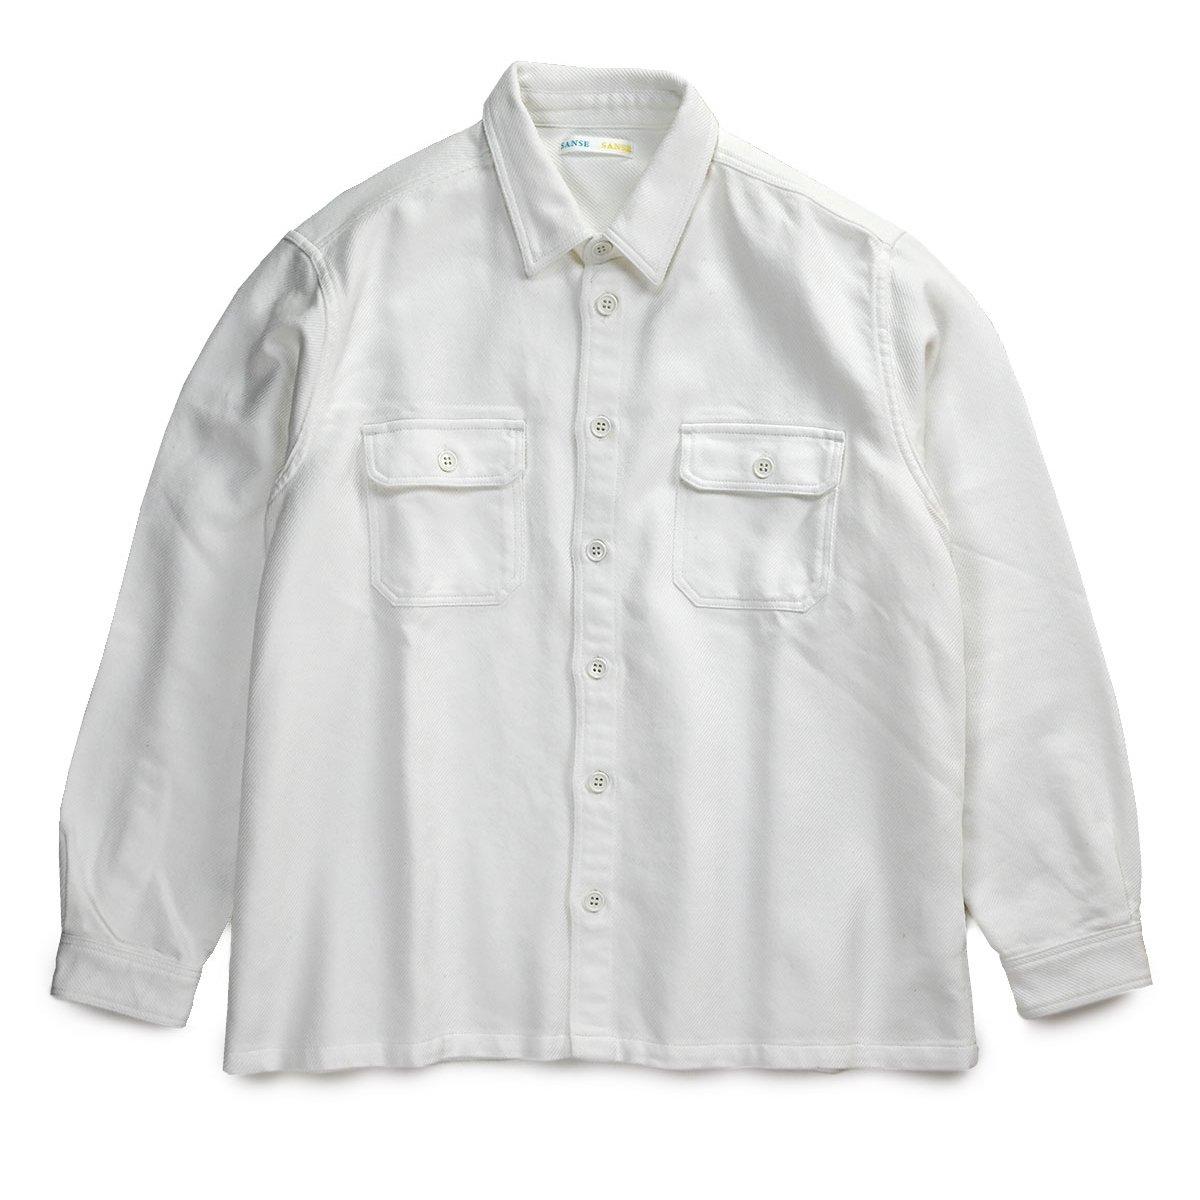 SANSE SANSE サンセサンセ / neru shirt